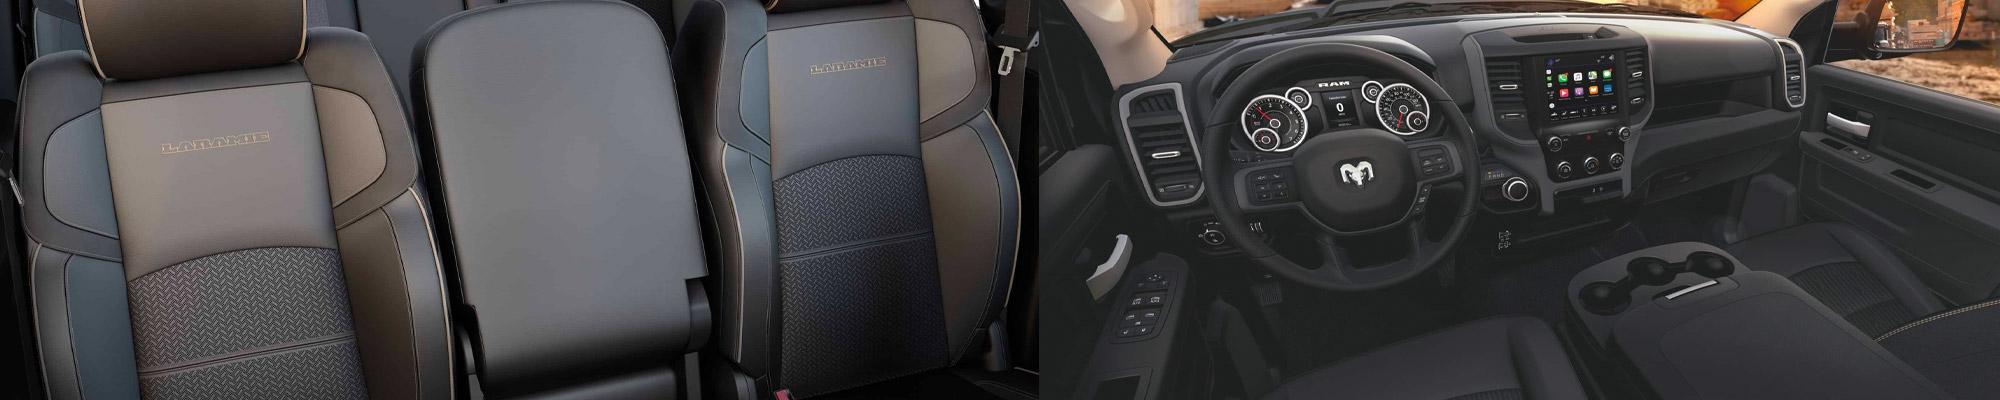 2020 Ram 3500 interior